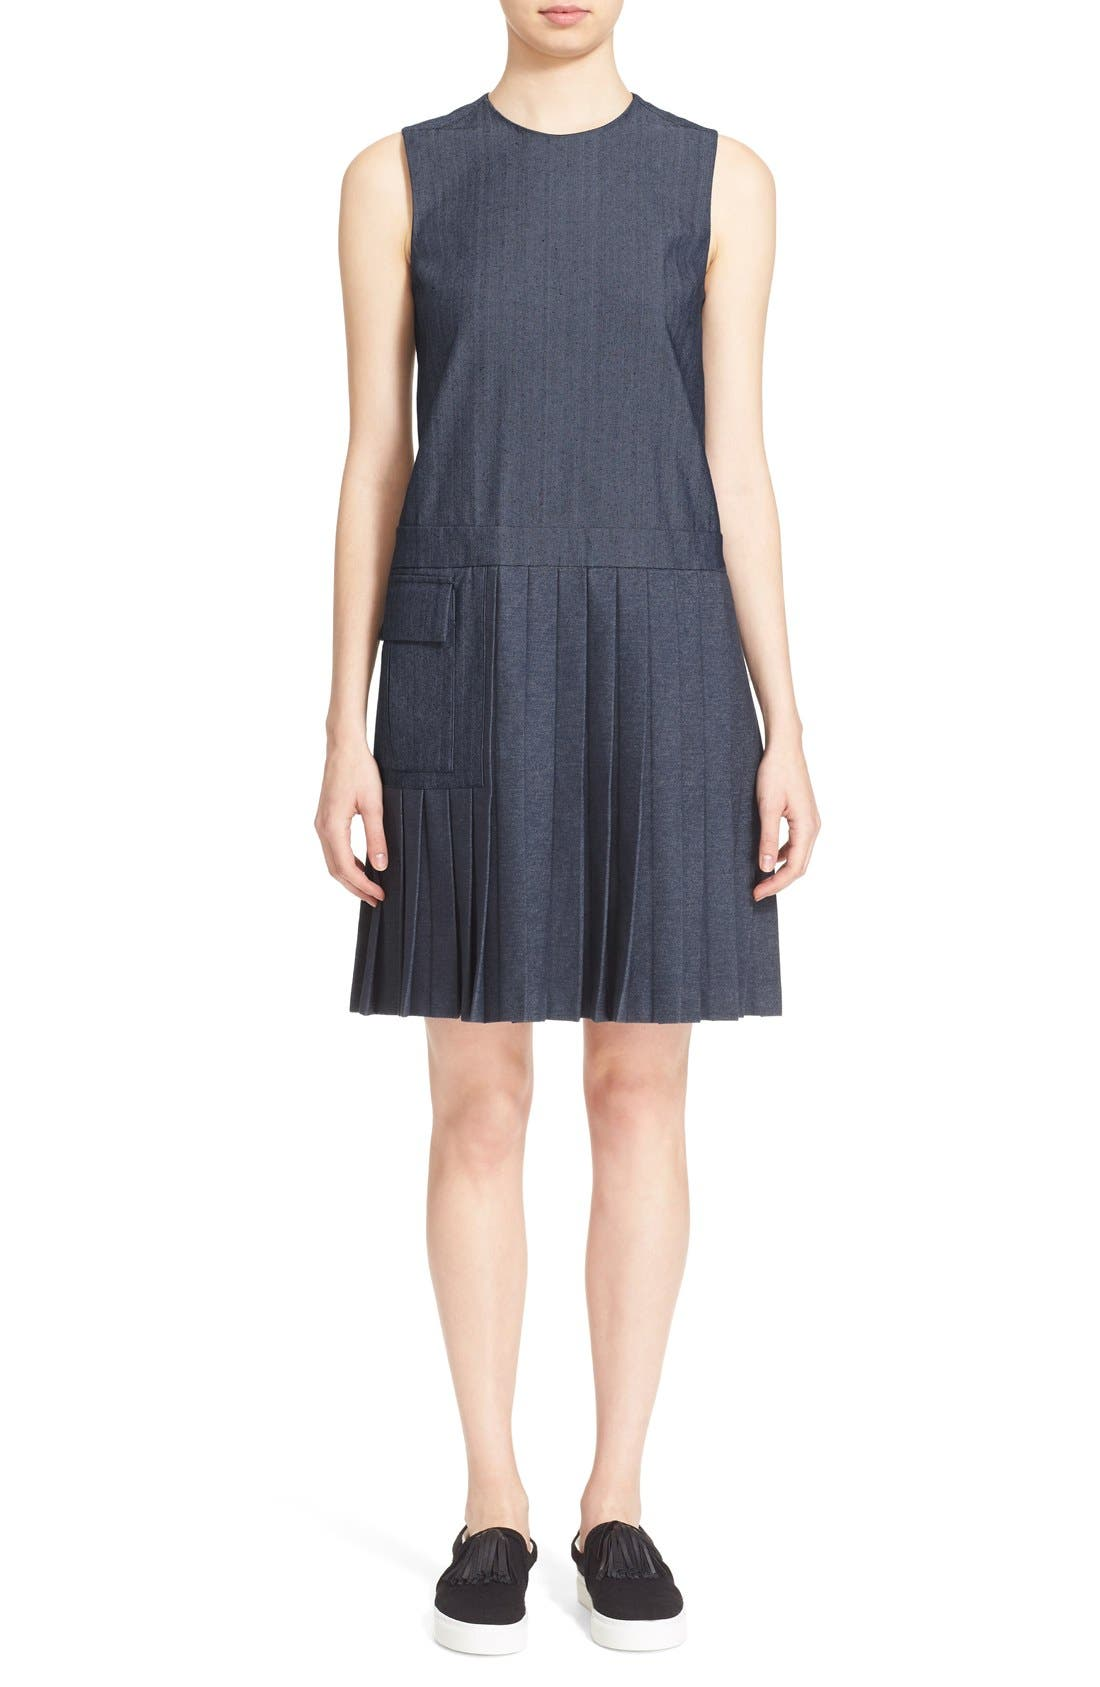 Alternate Image 1 Selected - MSGM Pleat Bottom Sleeveless Shift Dress